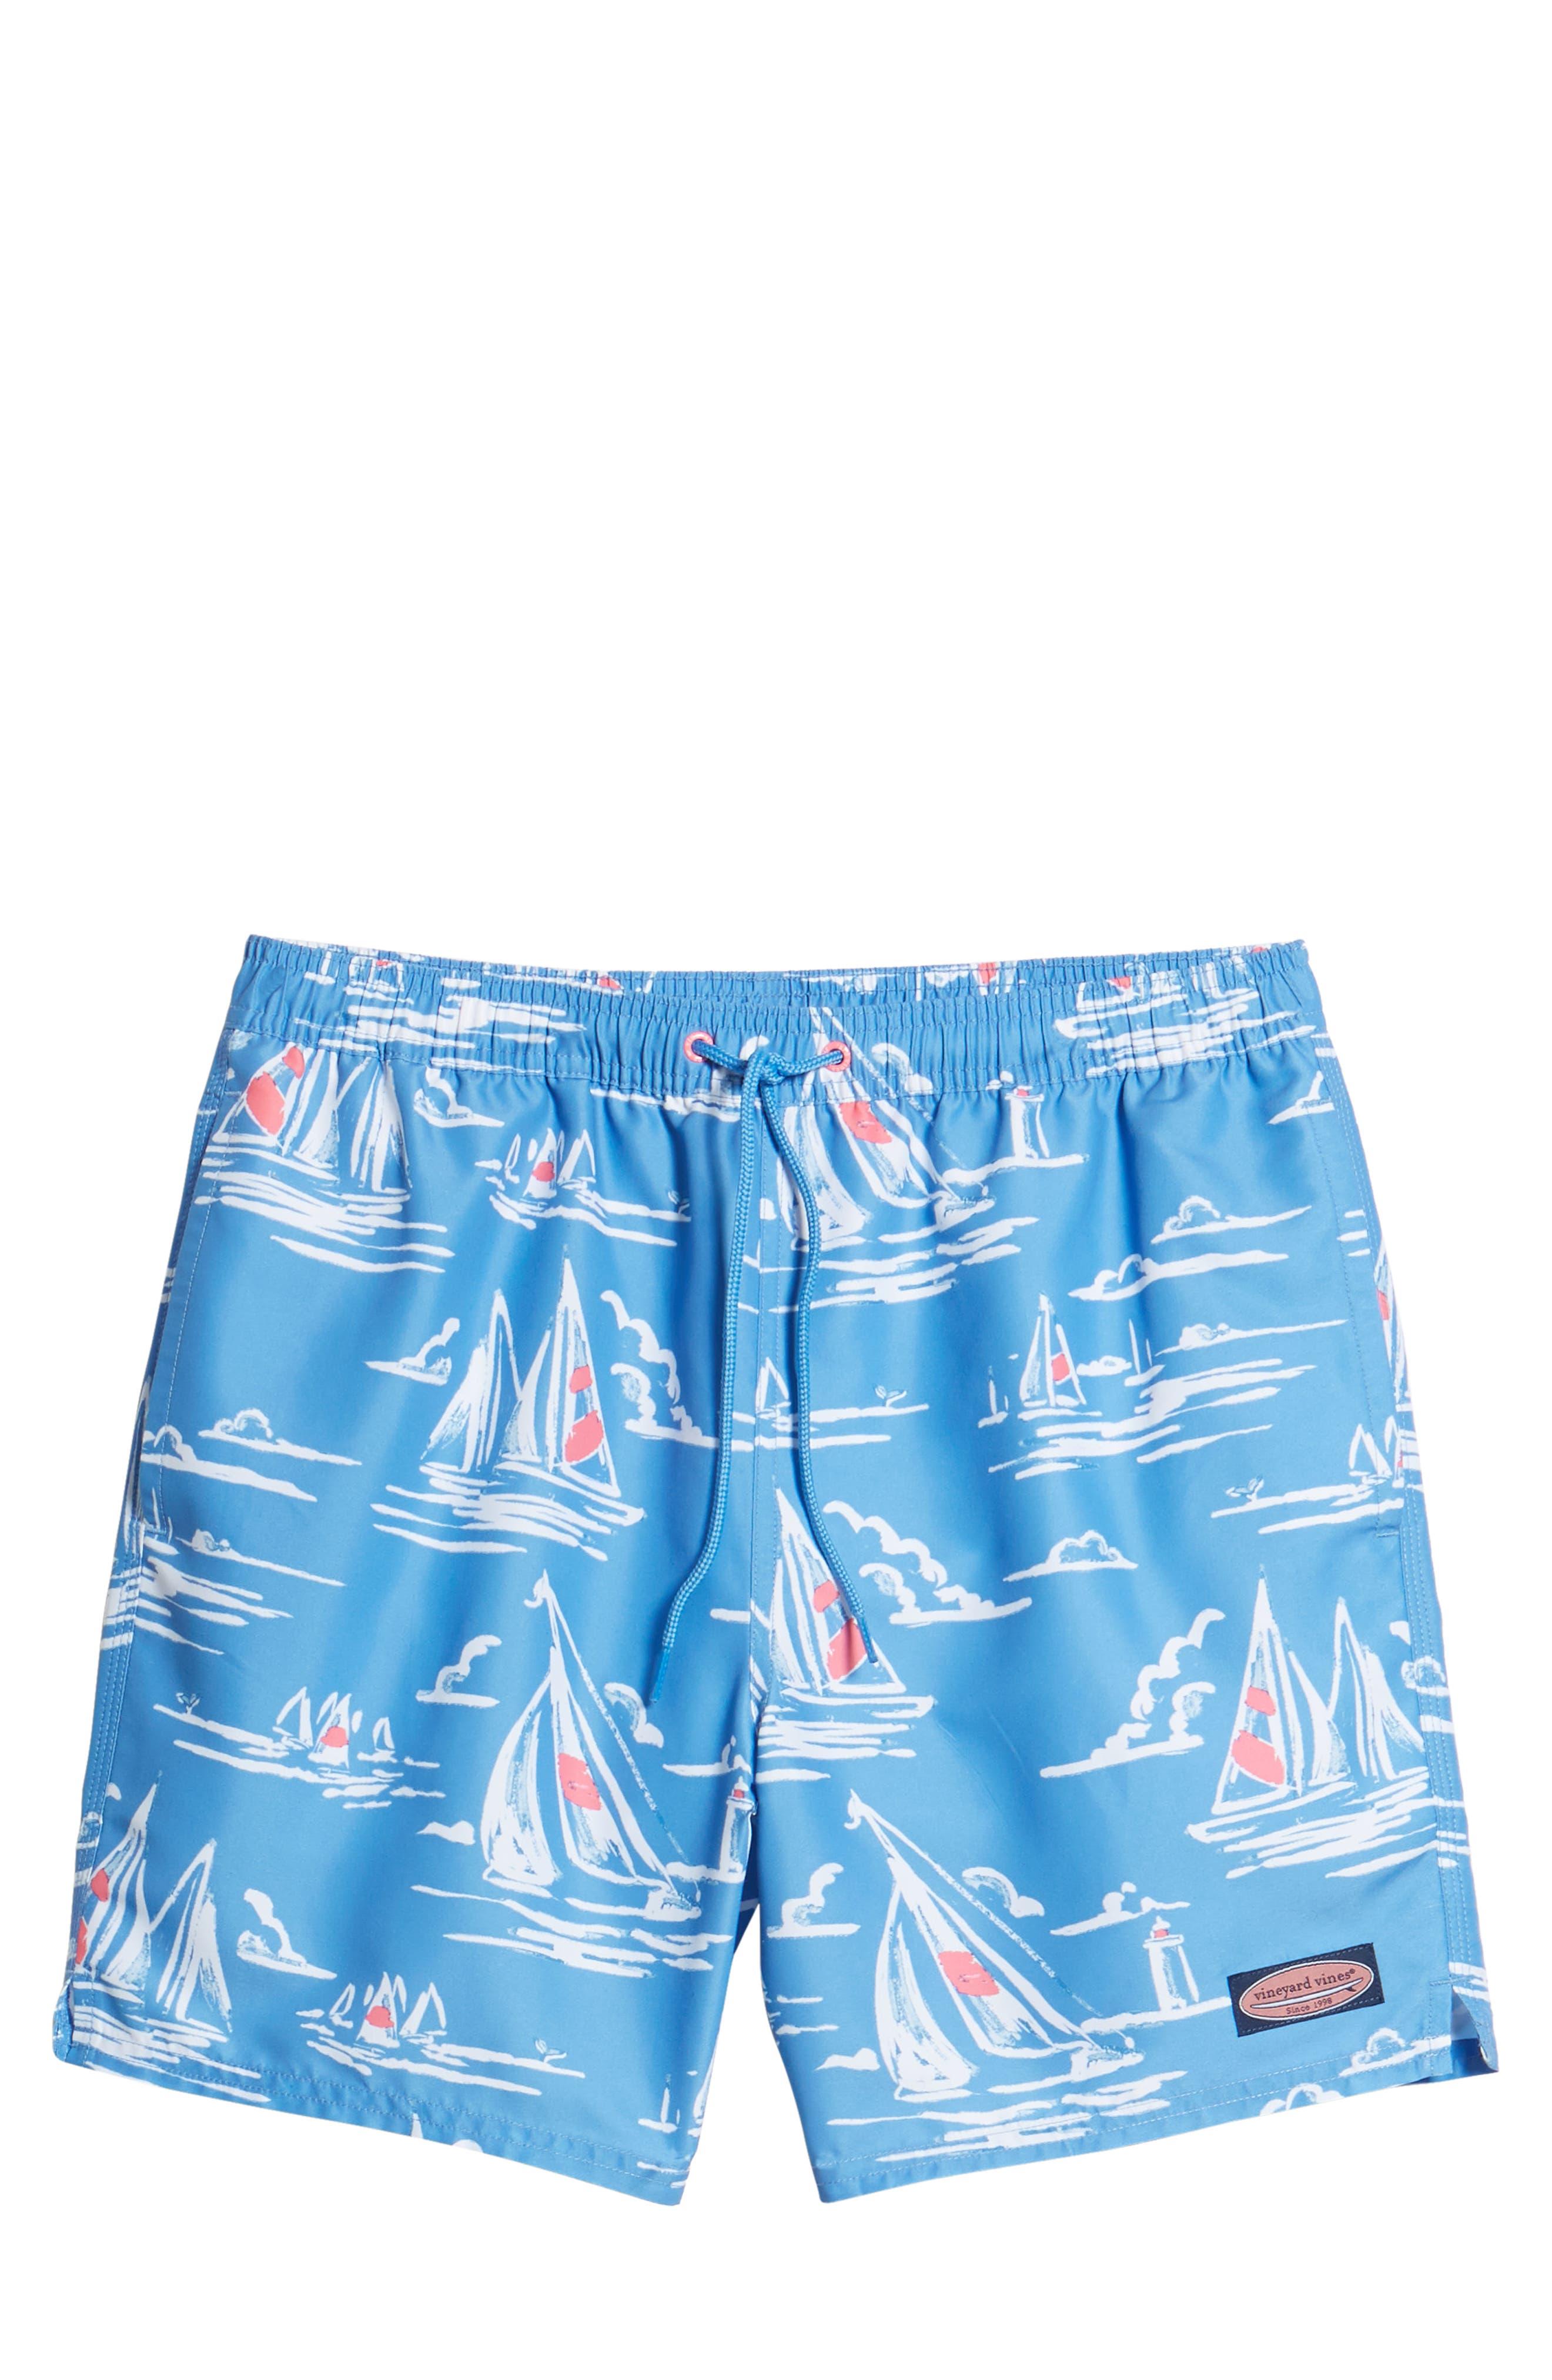 Chappy Sailing Scene Swim Trunks,                             Alternate thumbnail 6, color,                             Cornflower